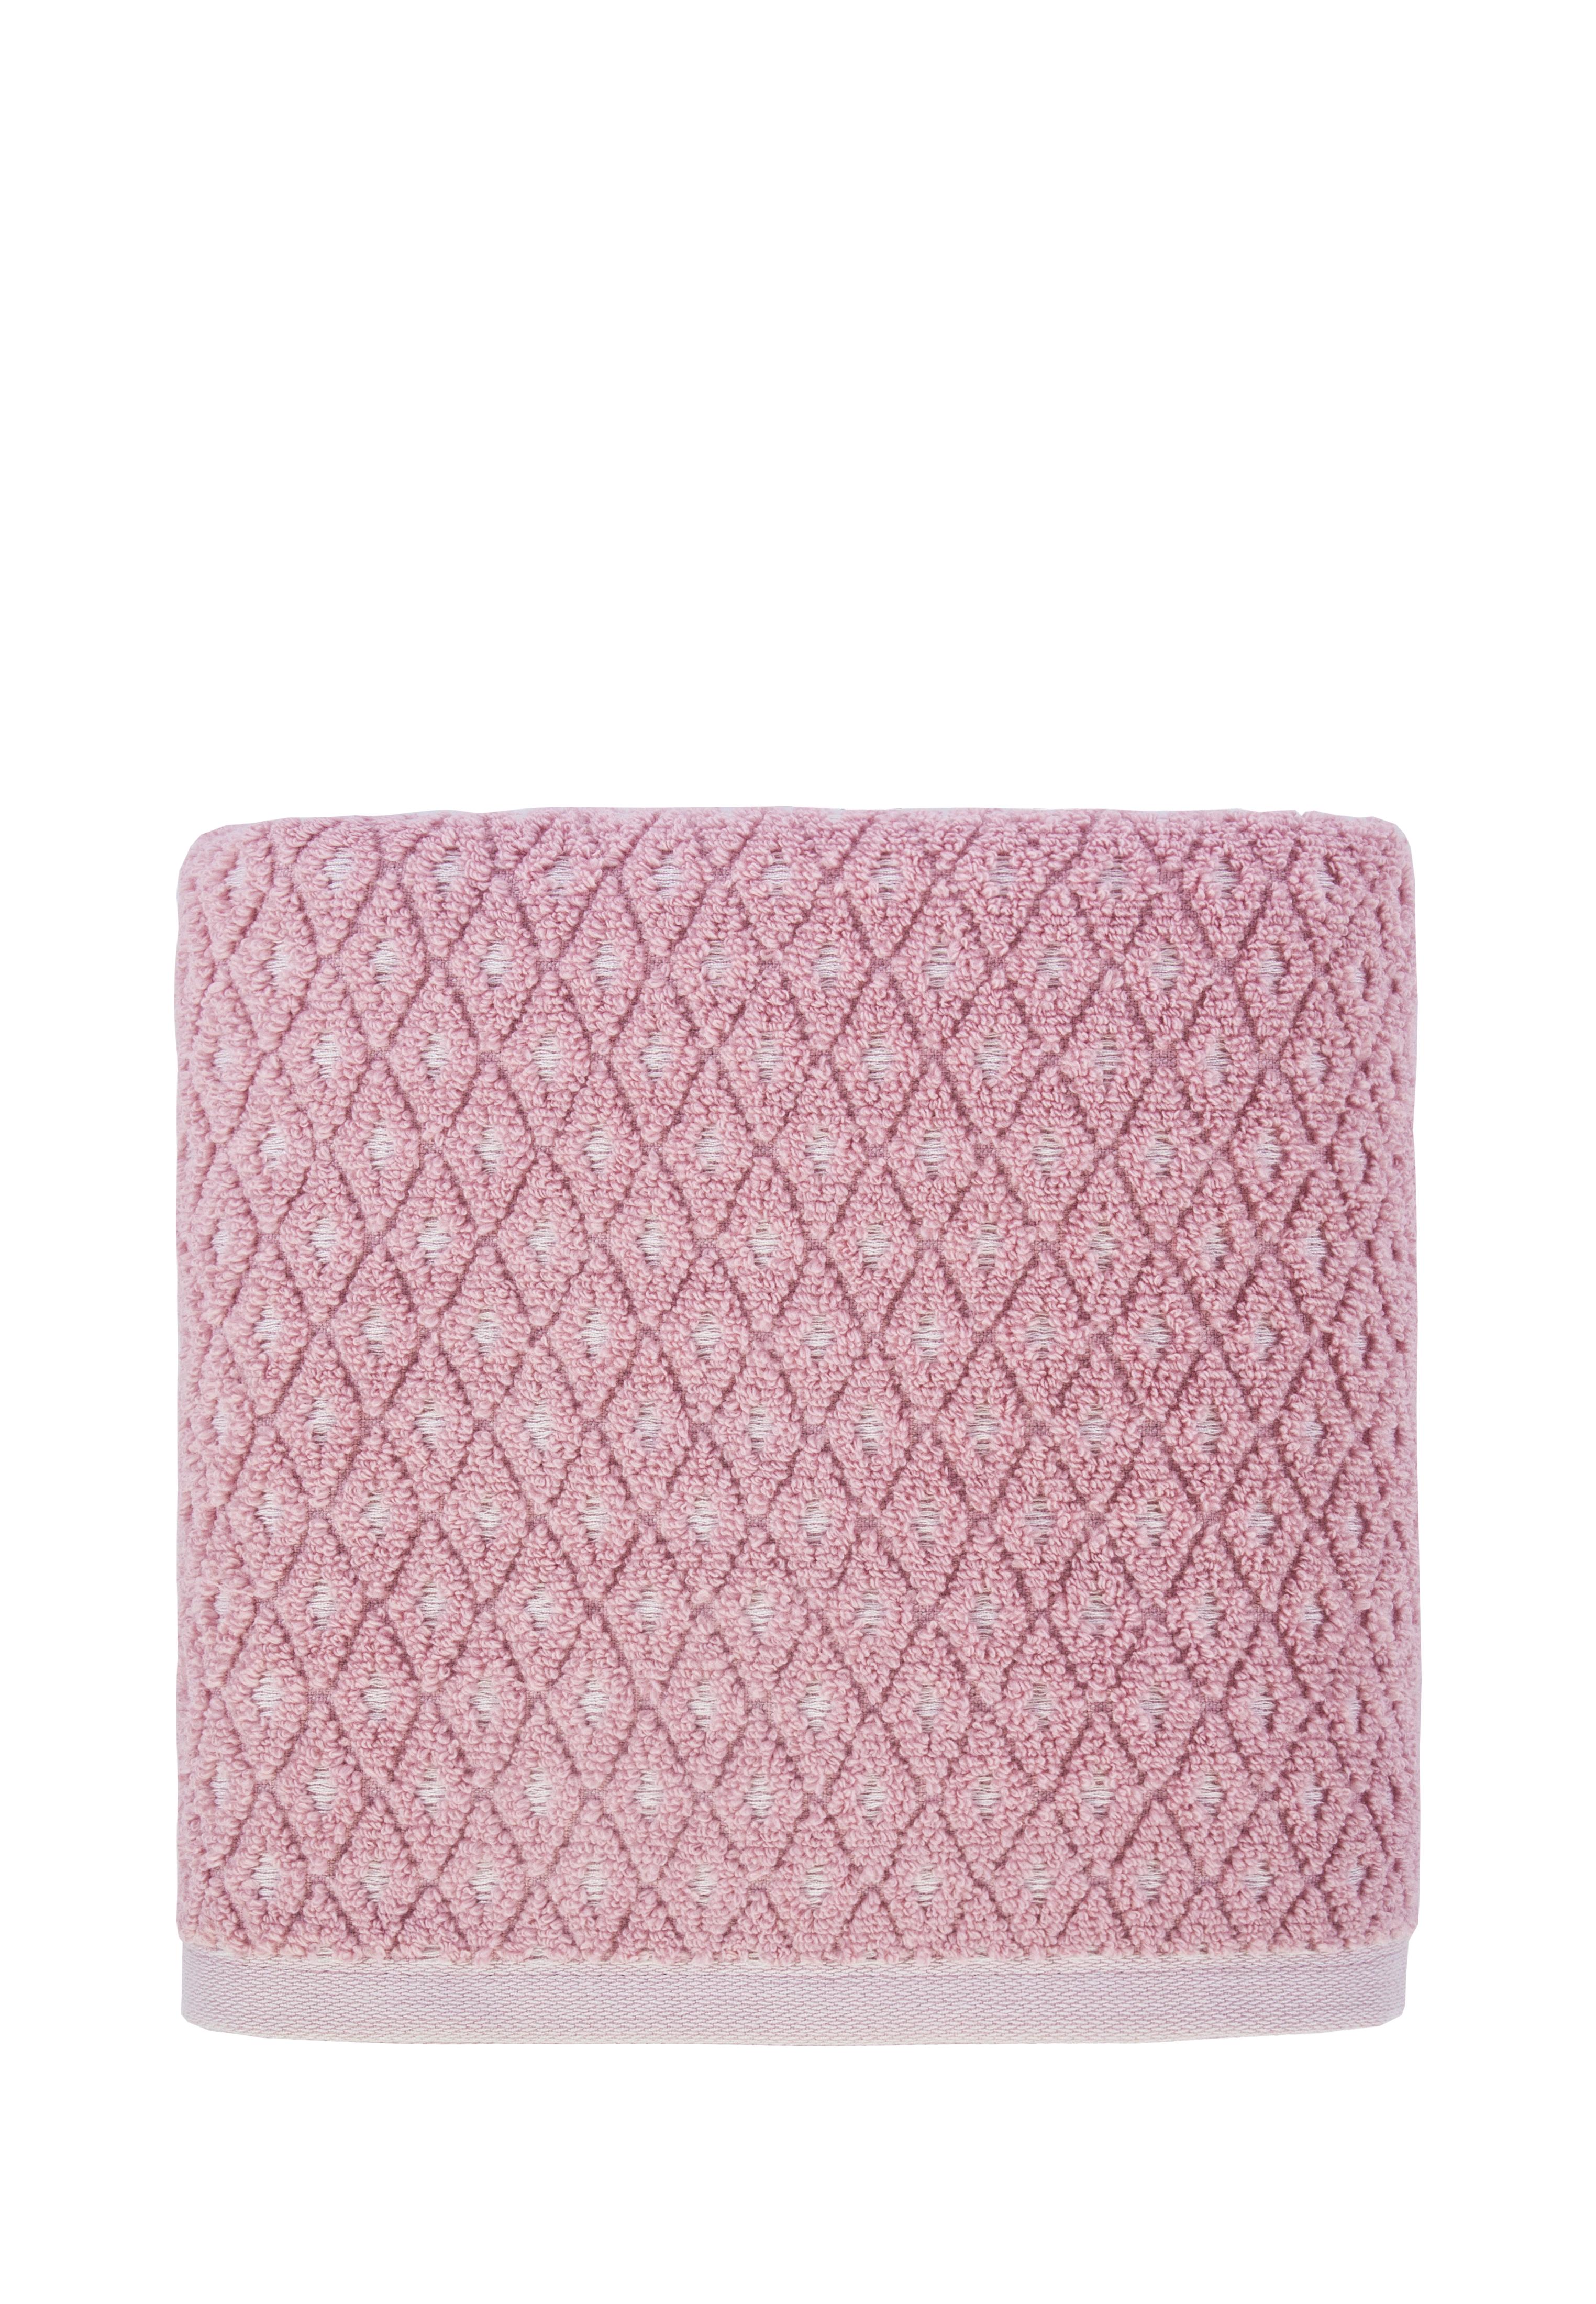 Фото - Полотенце банное Arya home collection Finn розовый, розовый полотенца arya полотенце жаккард arya levi бежевый 70 140 см